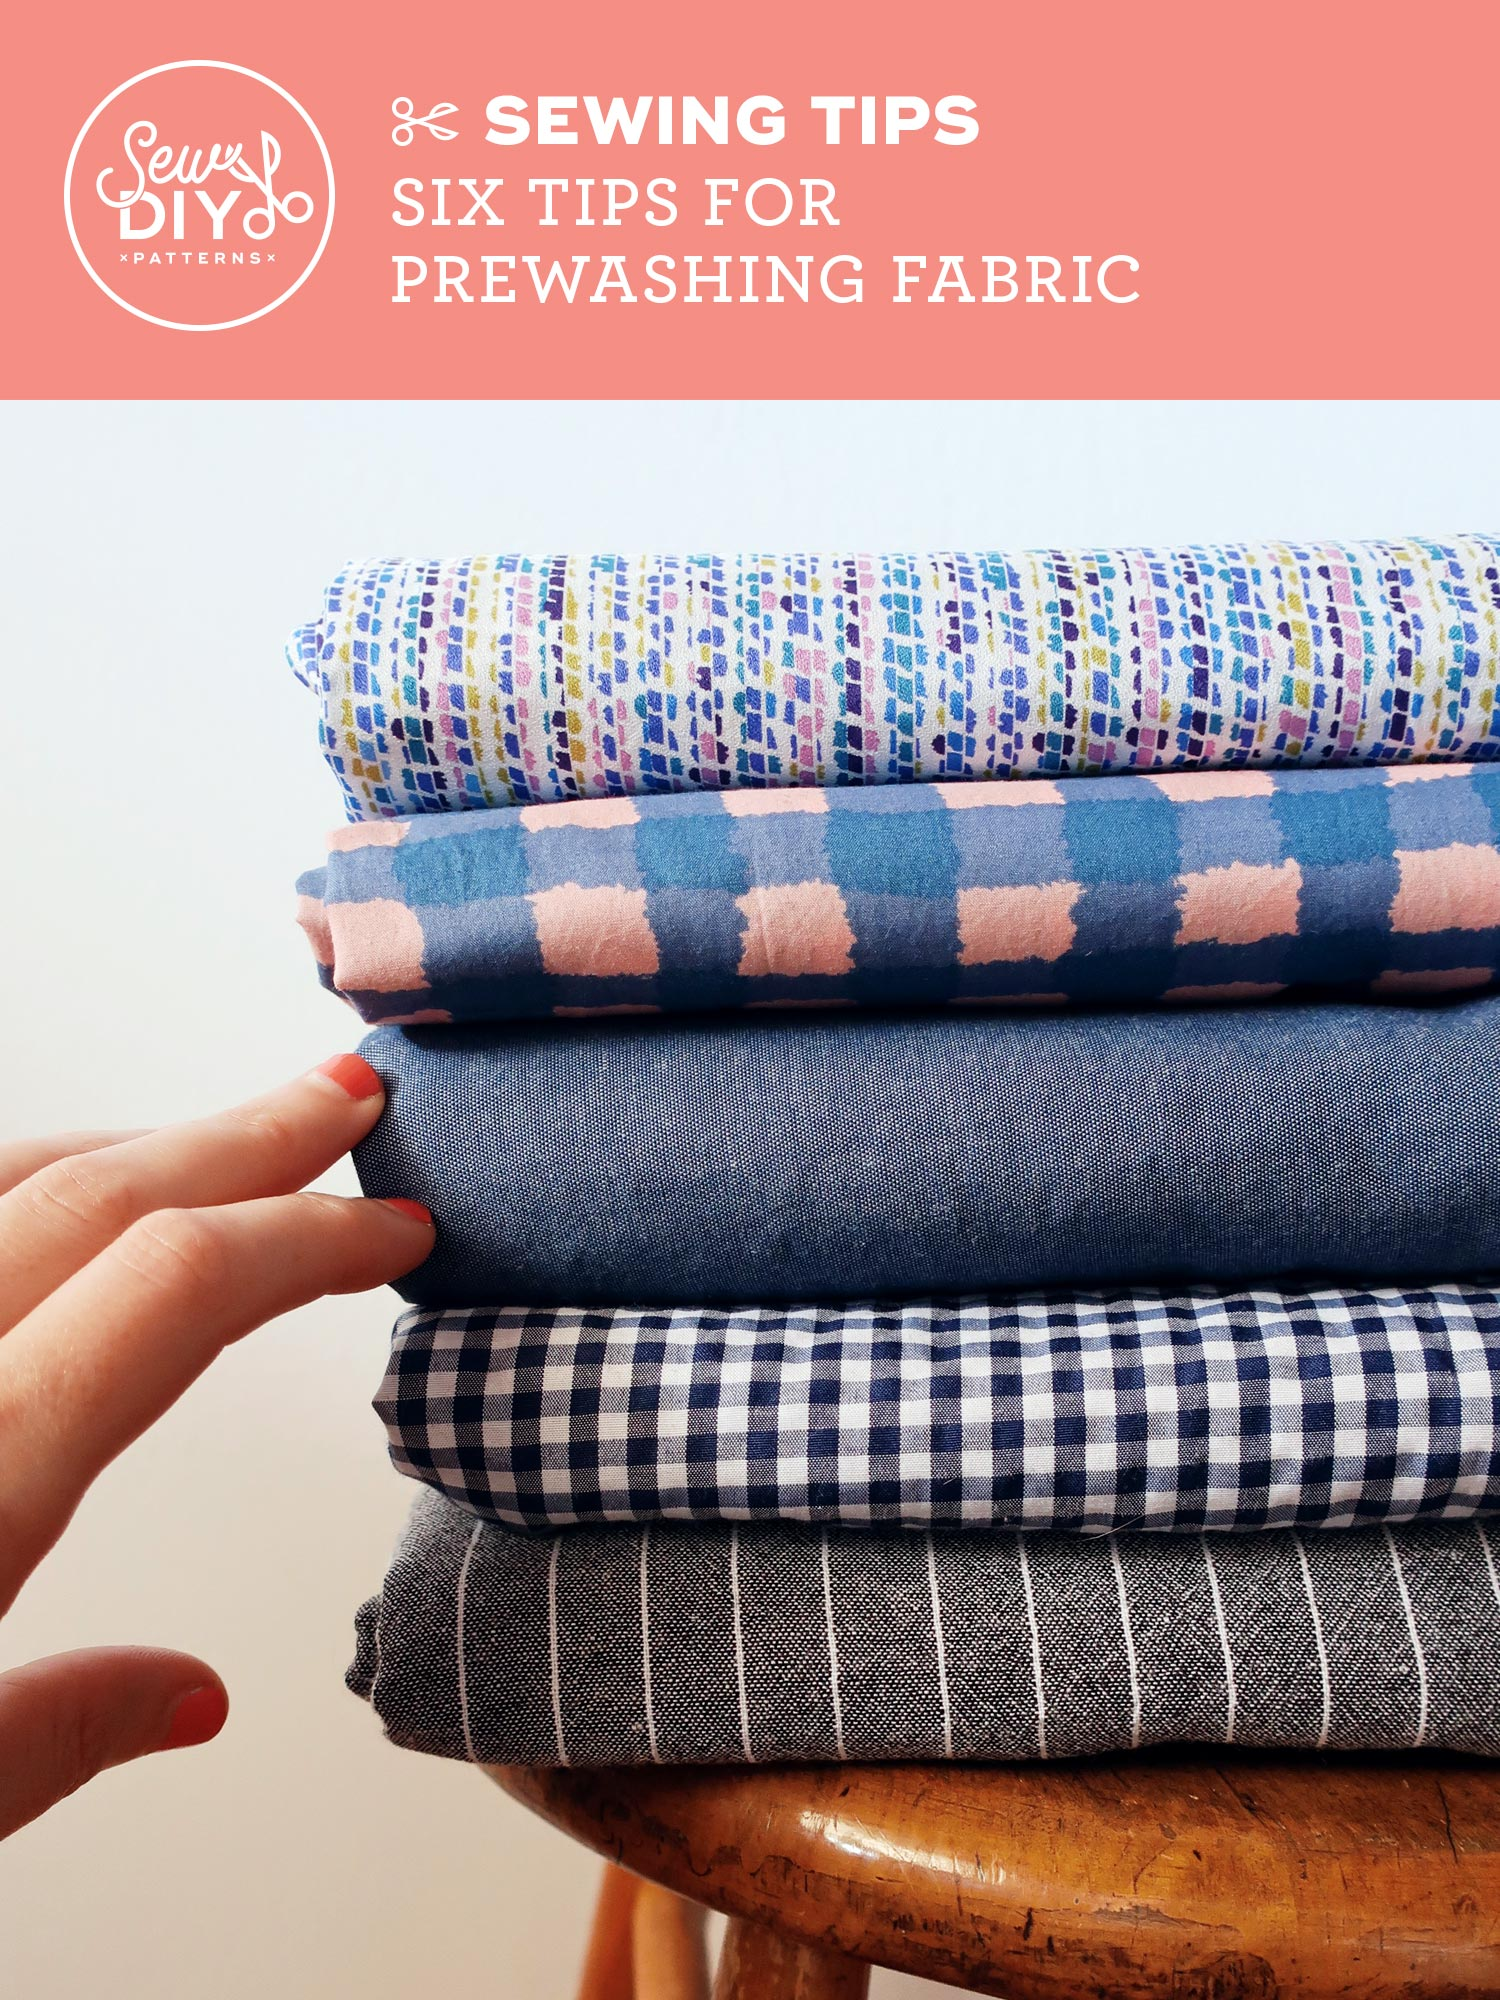 VIDEO Six Tips for Prewashing Fabric by Sew DIY